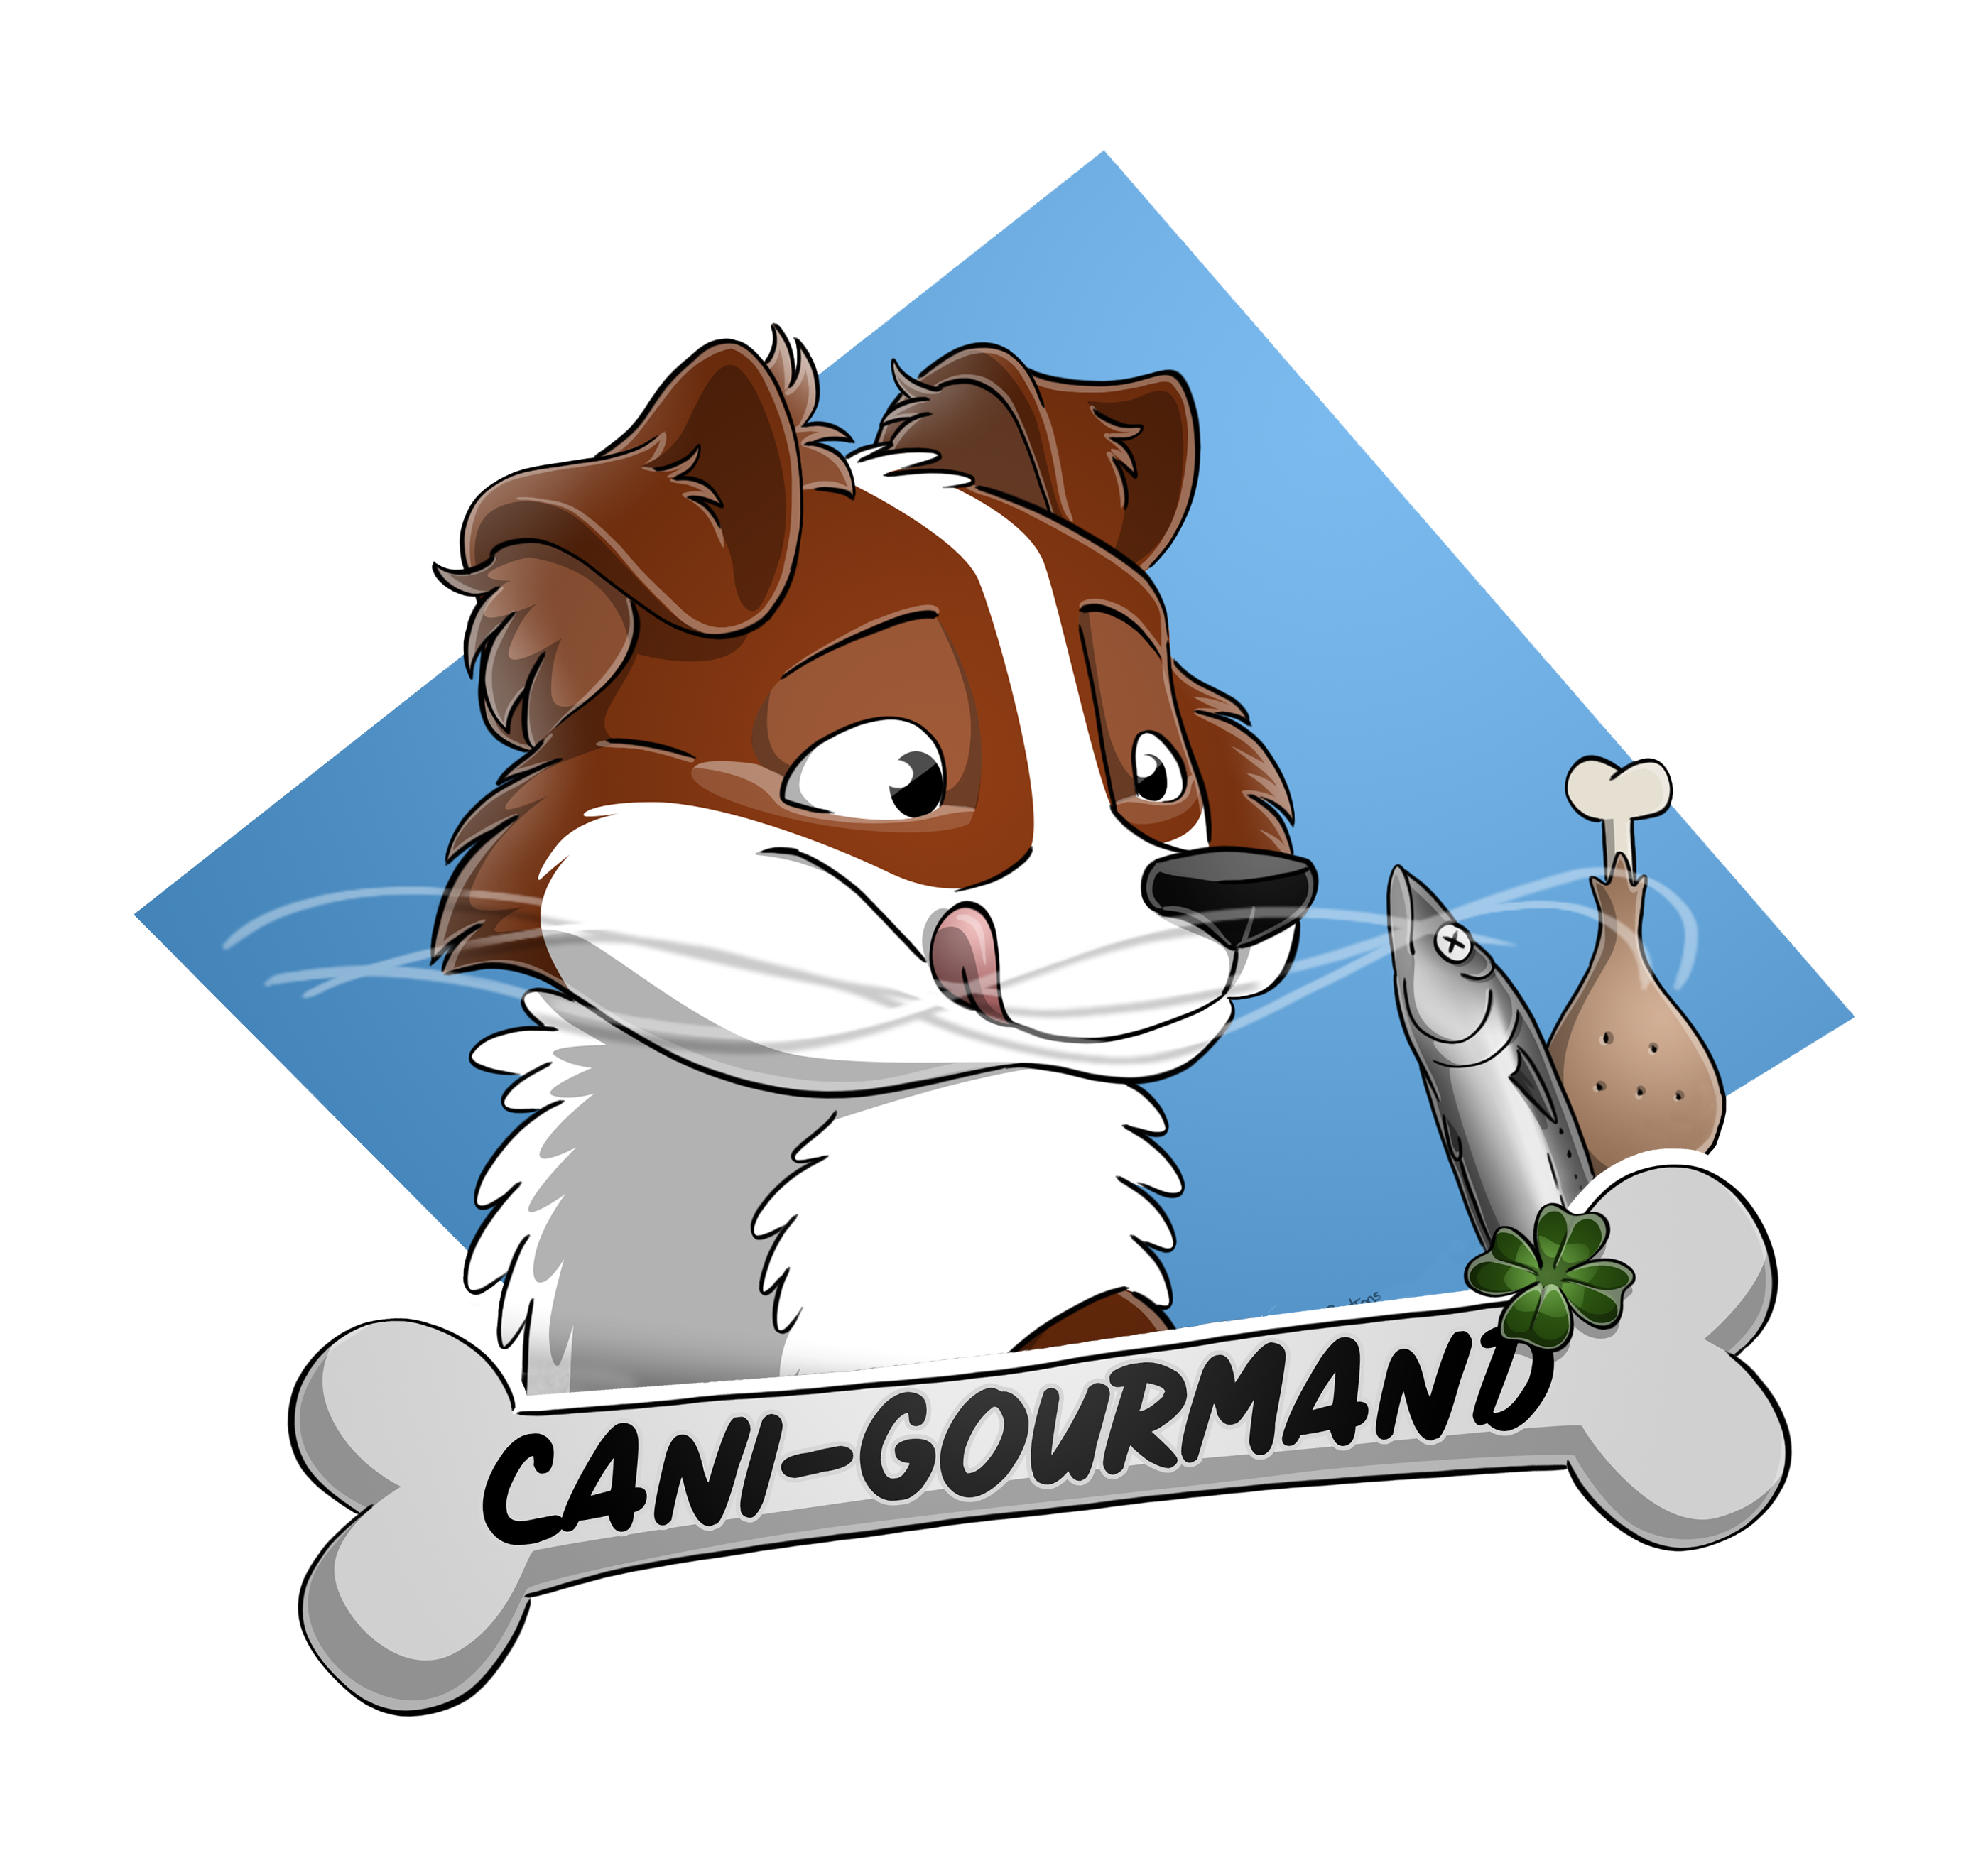 Cani-gourmand